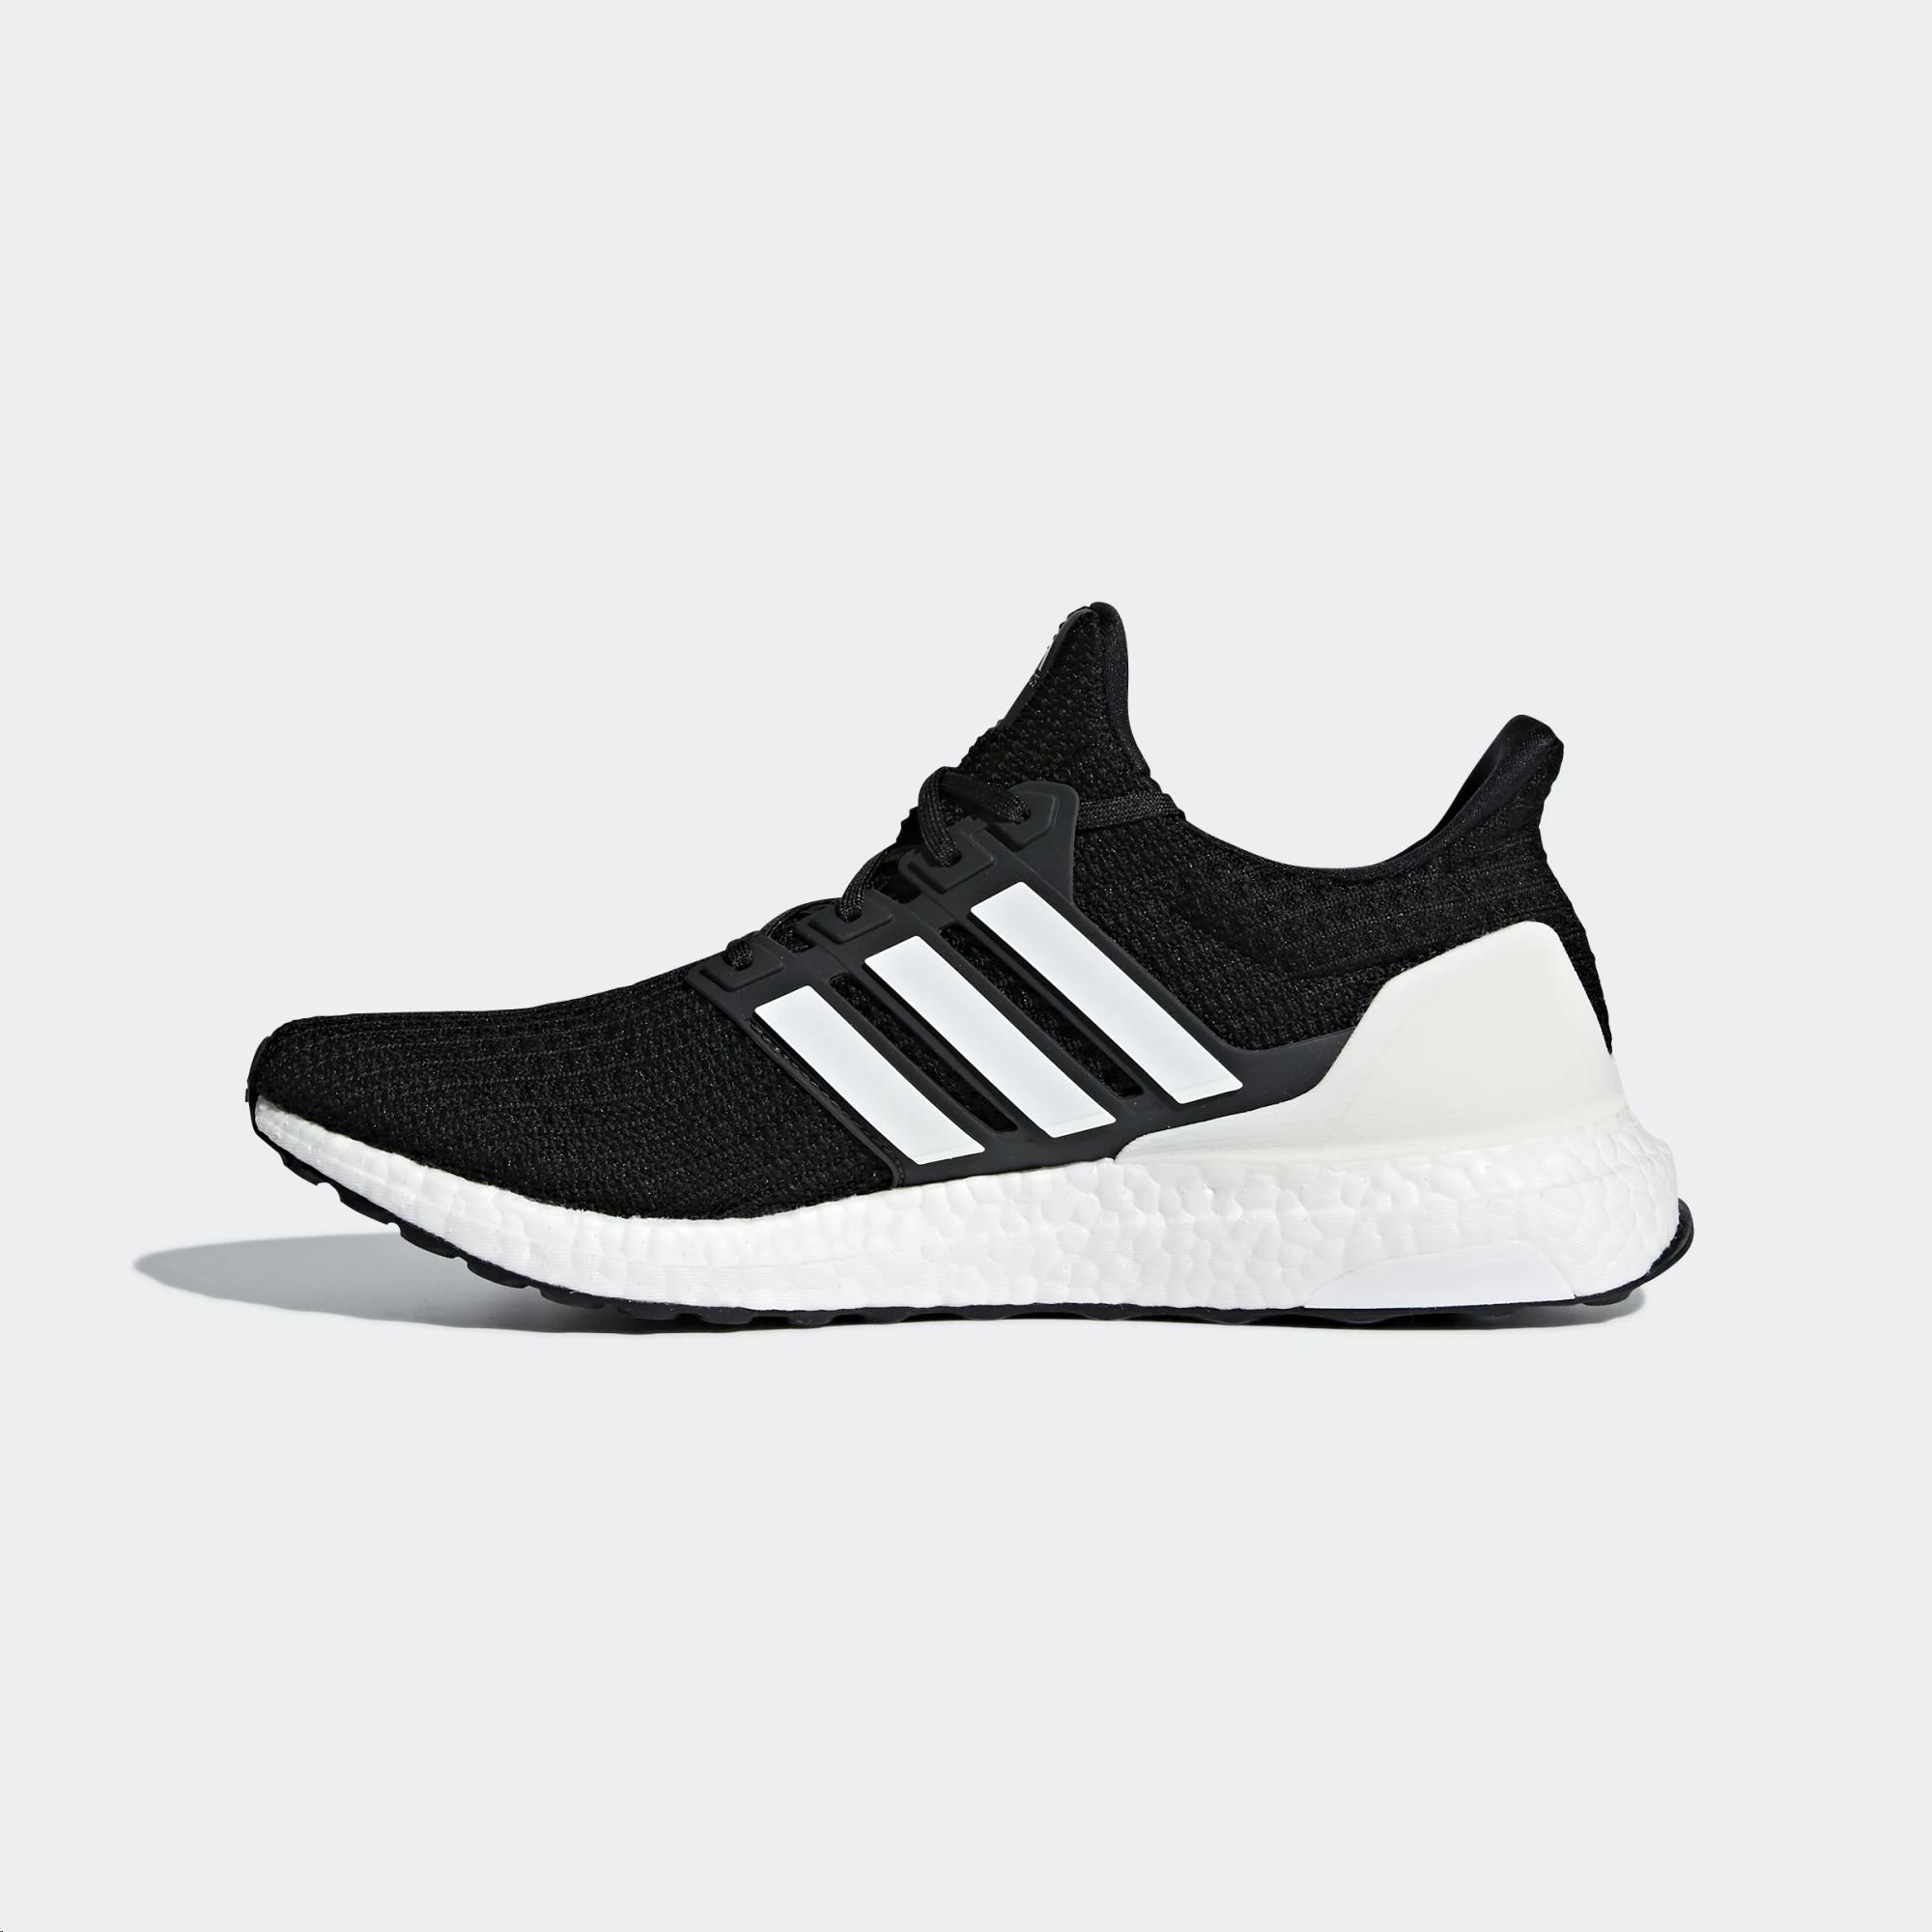 ce8ed680 Zapatillas running Adidas UltraBoost 4.0 negro/blco hombre - Deportes Moya